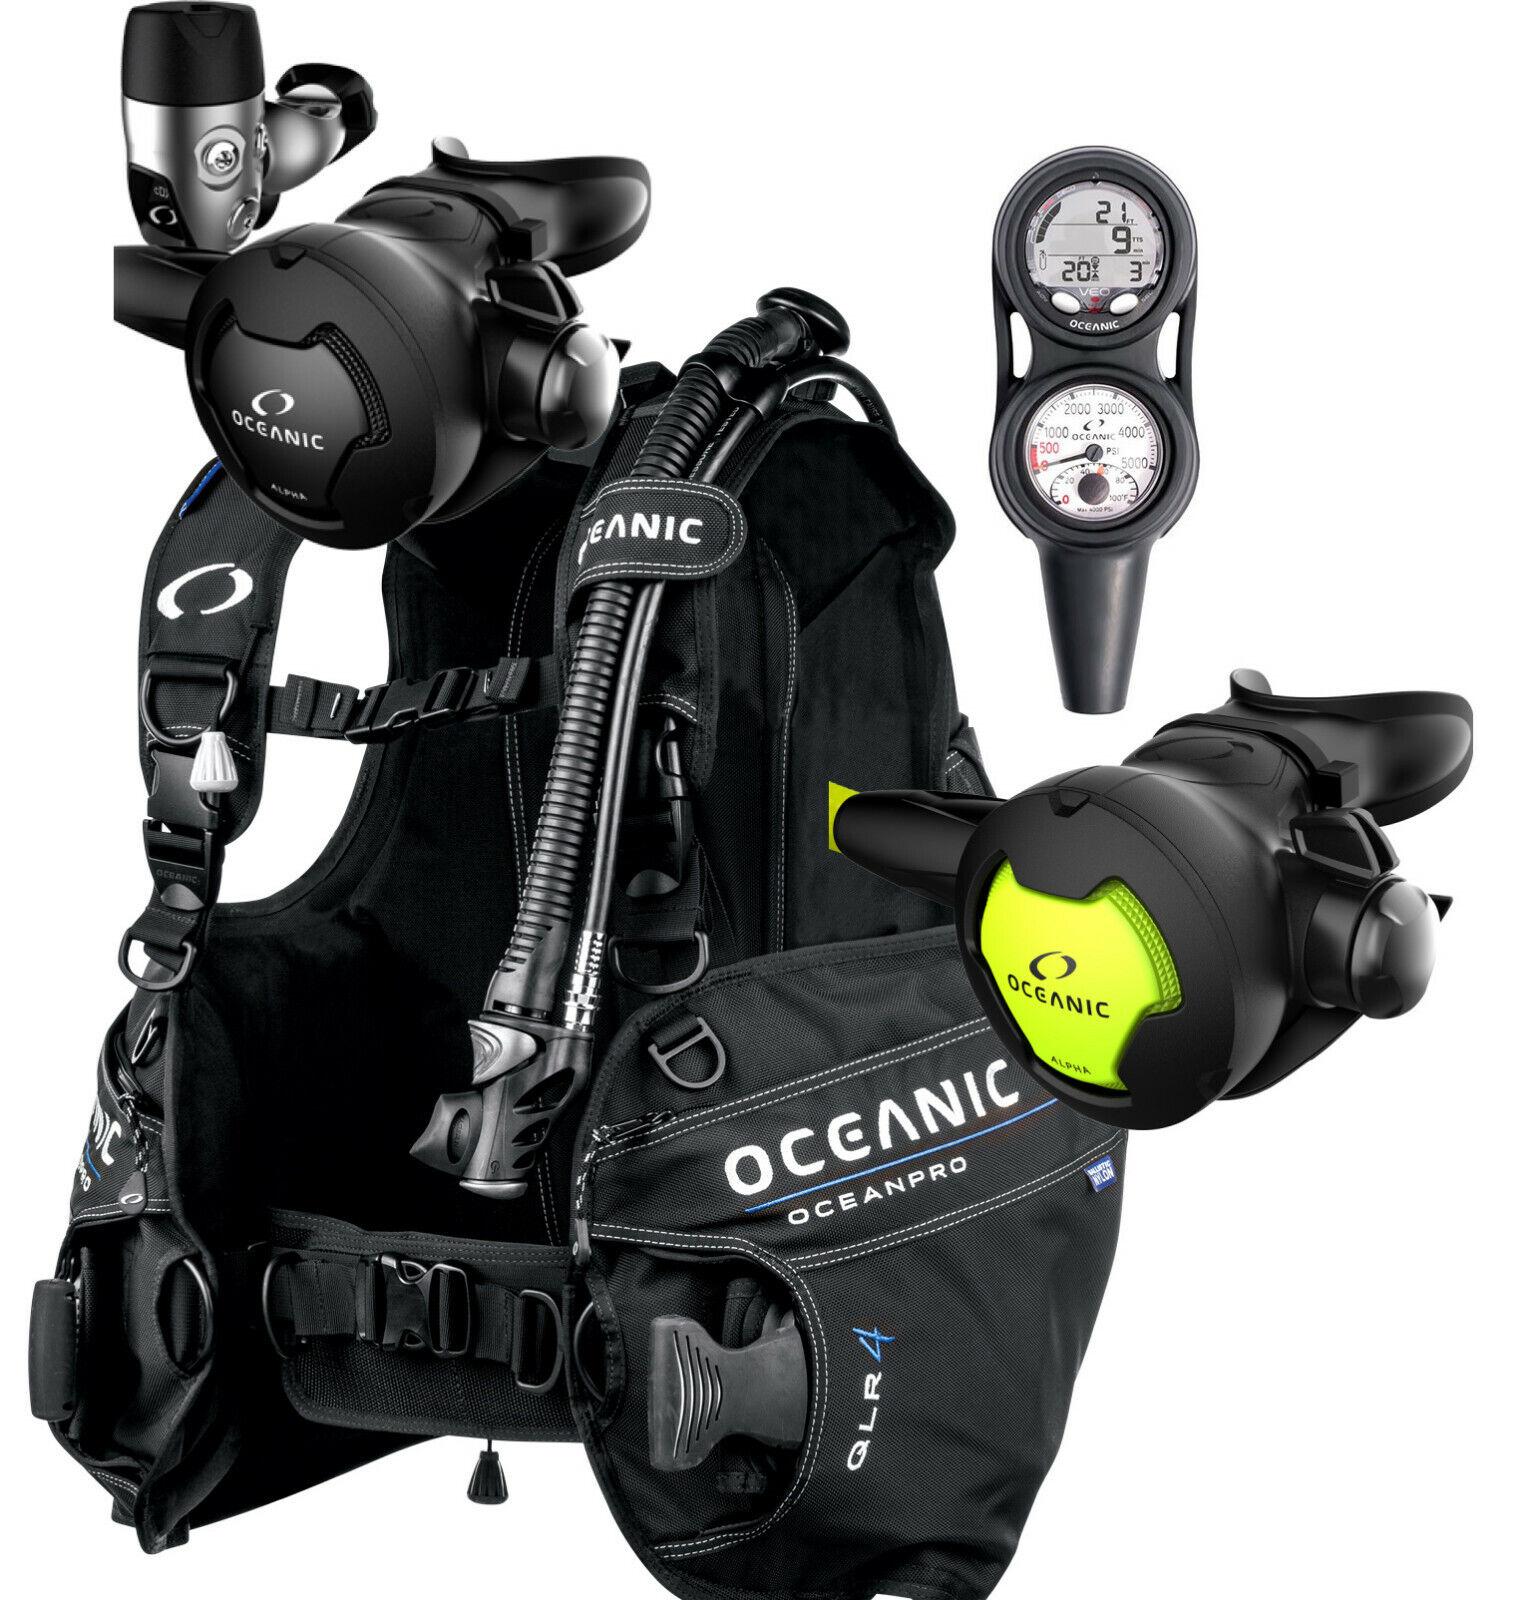 Oceanic Alpha 10, Ocean pro, Veo Computer Pacchetto Scuba Diving Regolatore XL